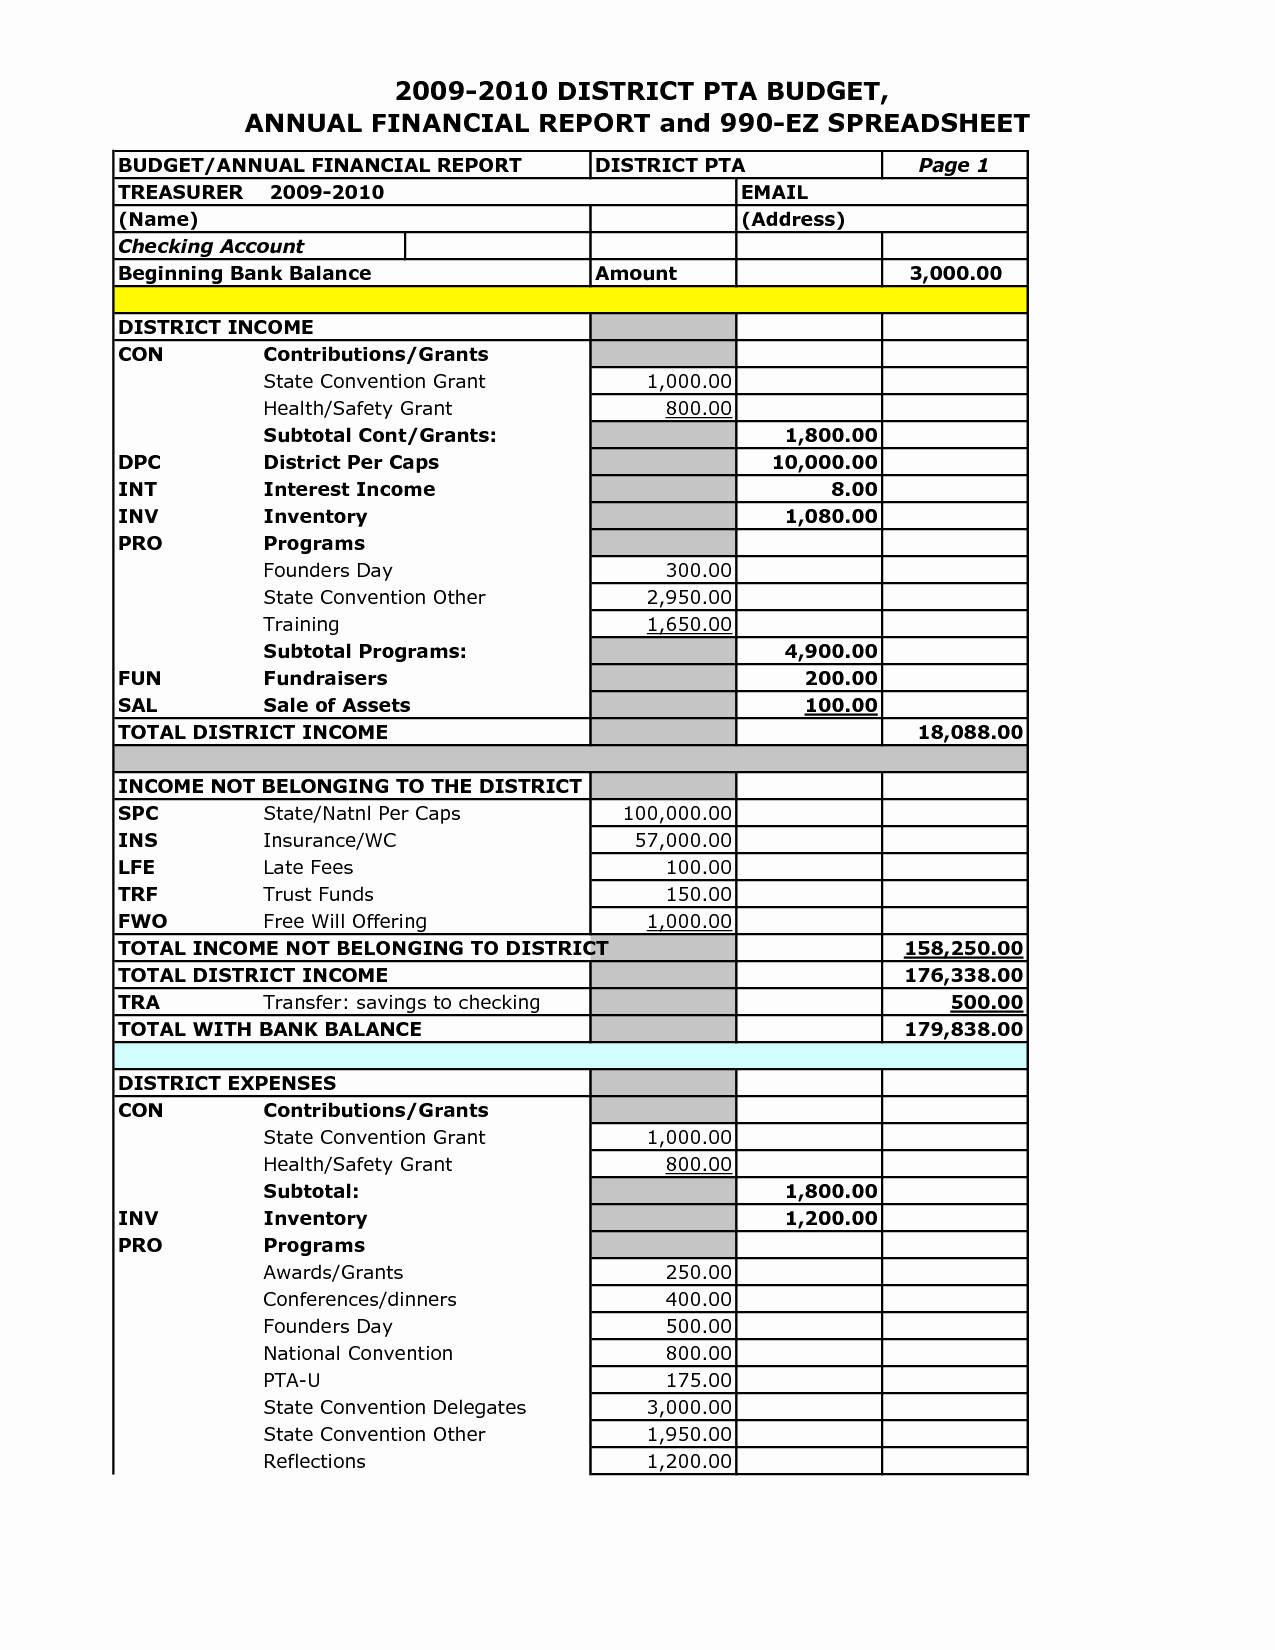 Tax Spreadsheet For Small Business Regarding Small Business Tax Expense Spreadsheet Income Preparation Return